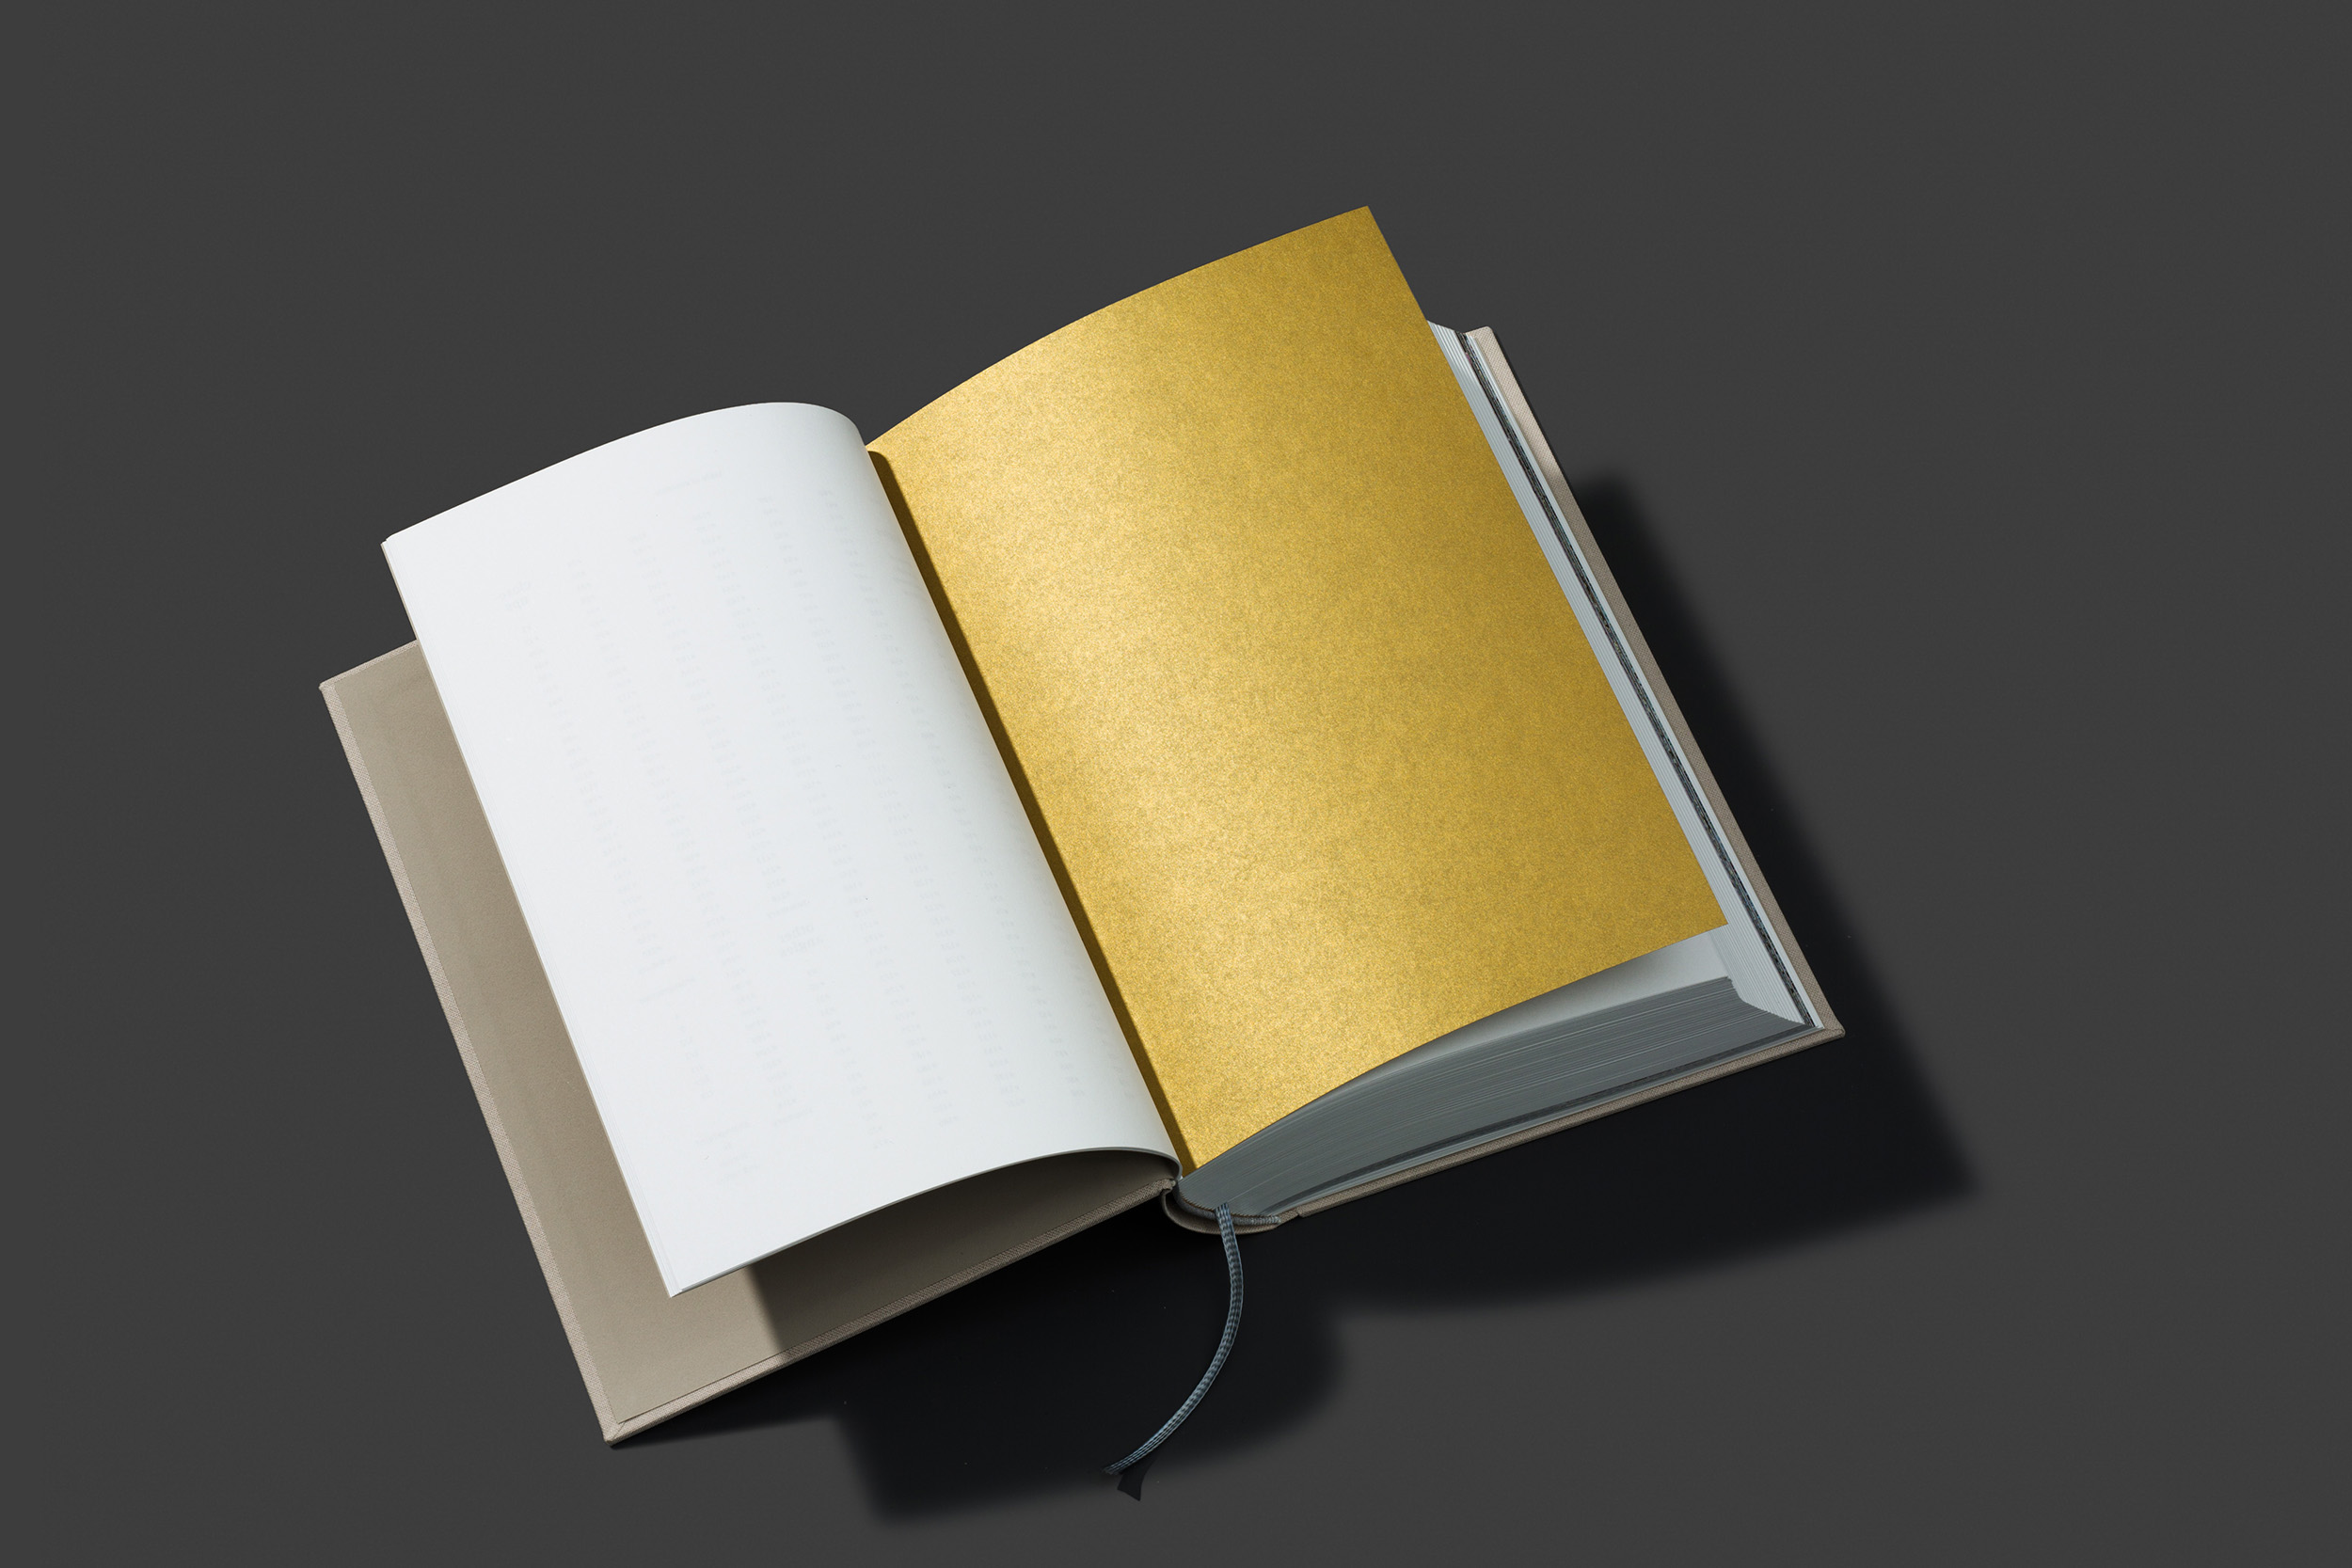 worthless_book_04.jpg